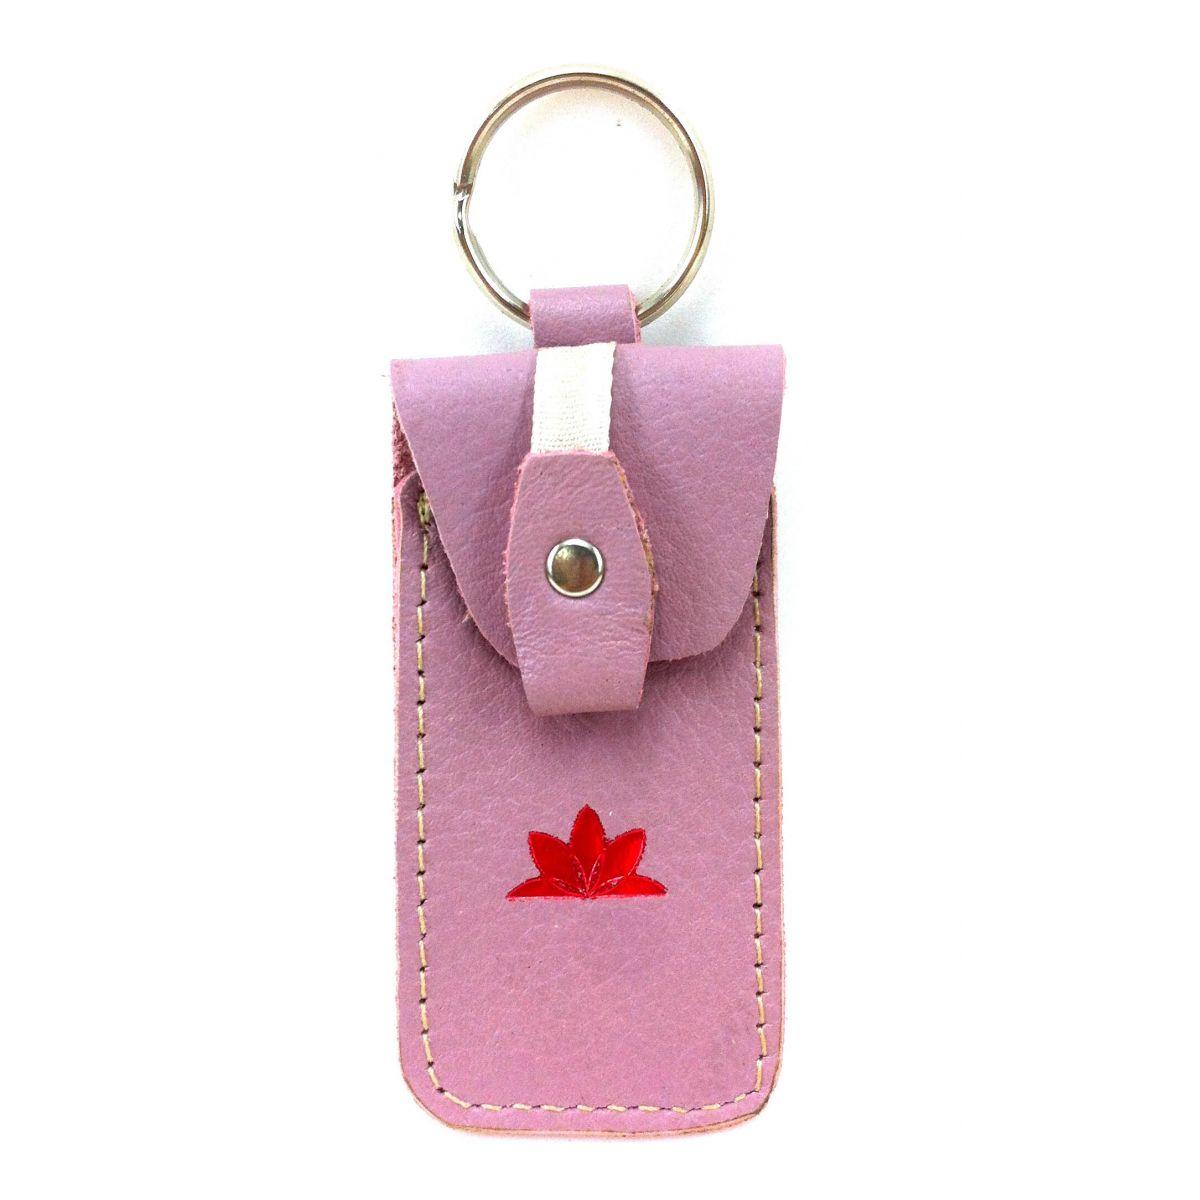 Porta pen drive de couro ecológico rosa Seminate